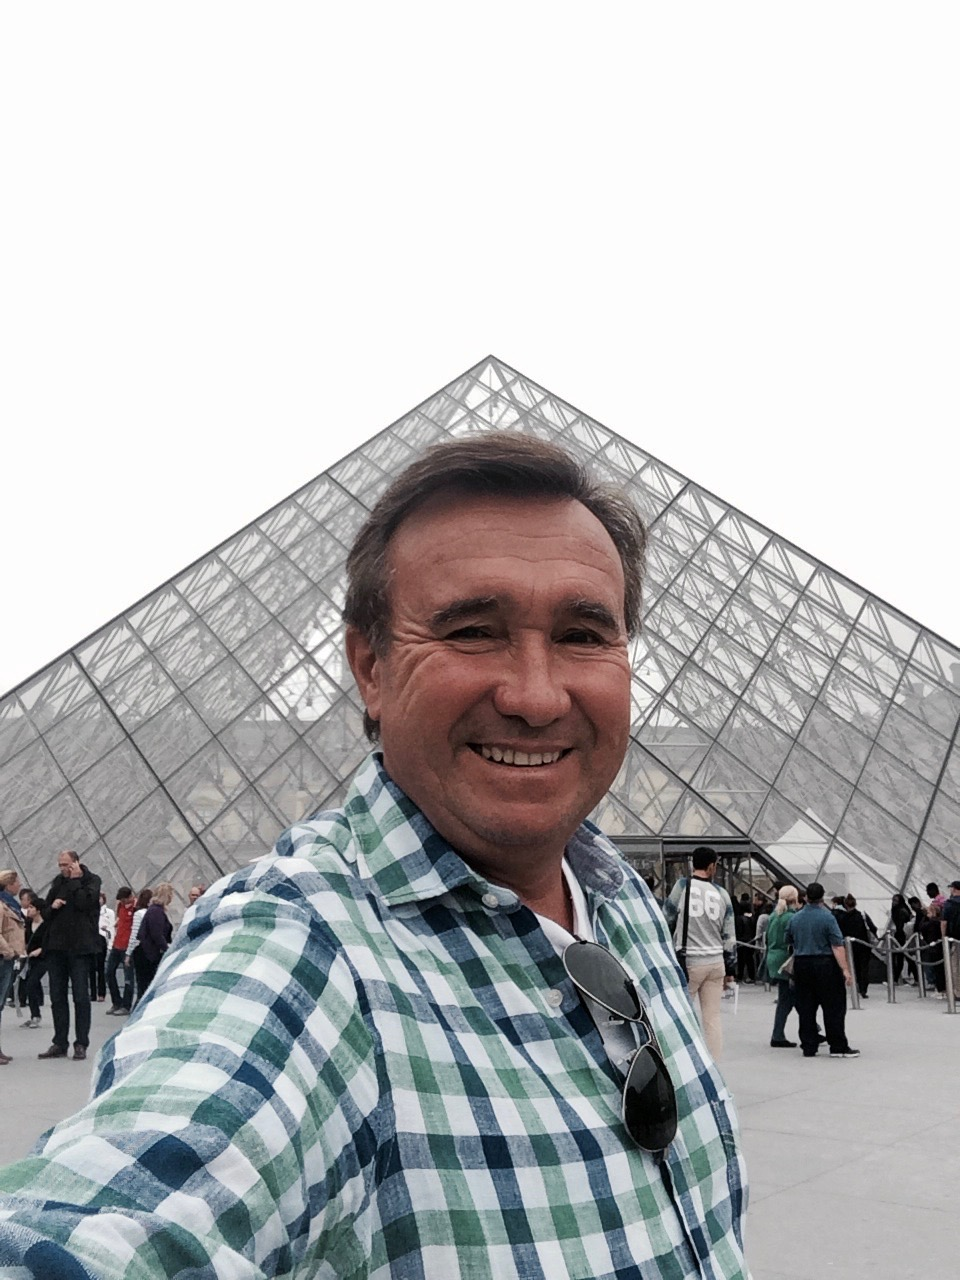 Una selfie frente a la pirámide del Louvre...